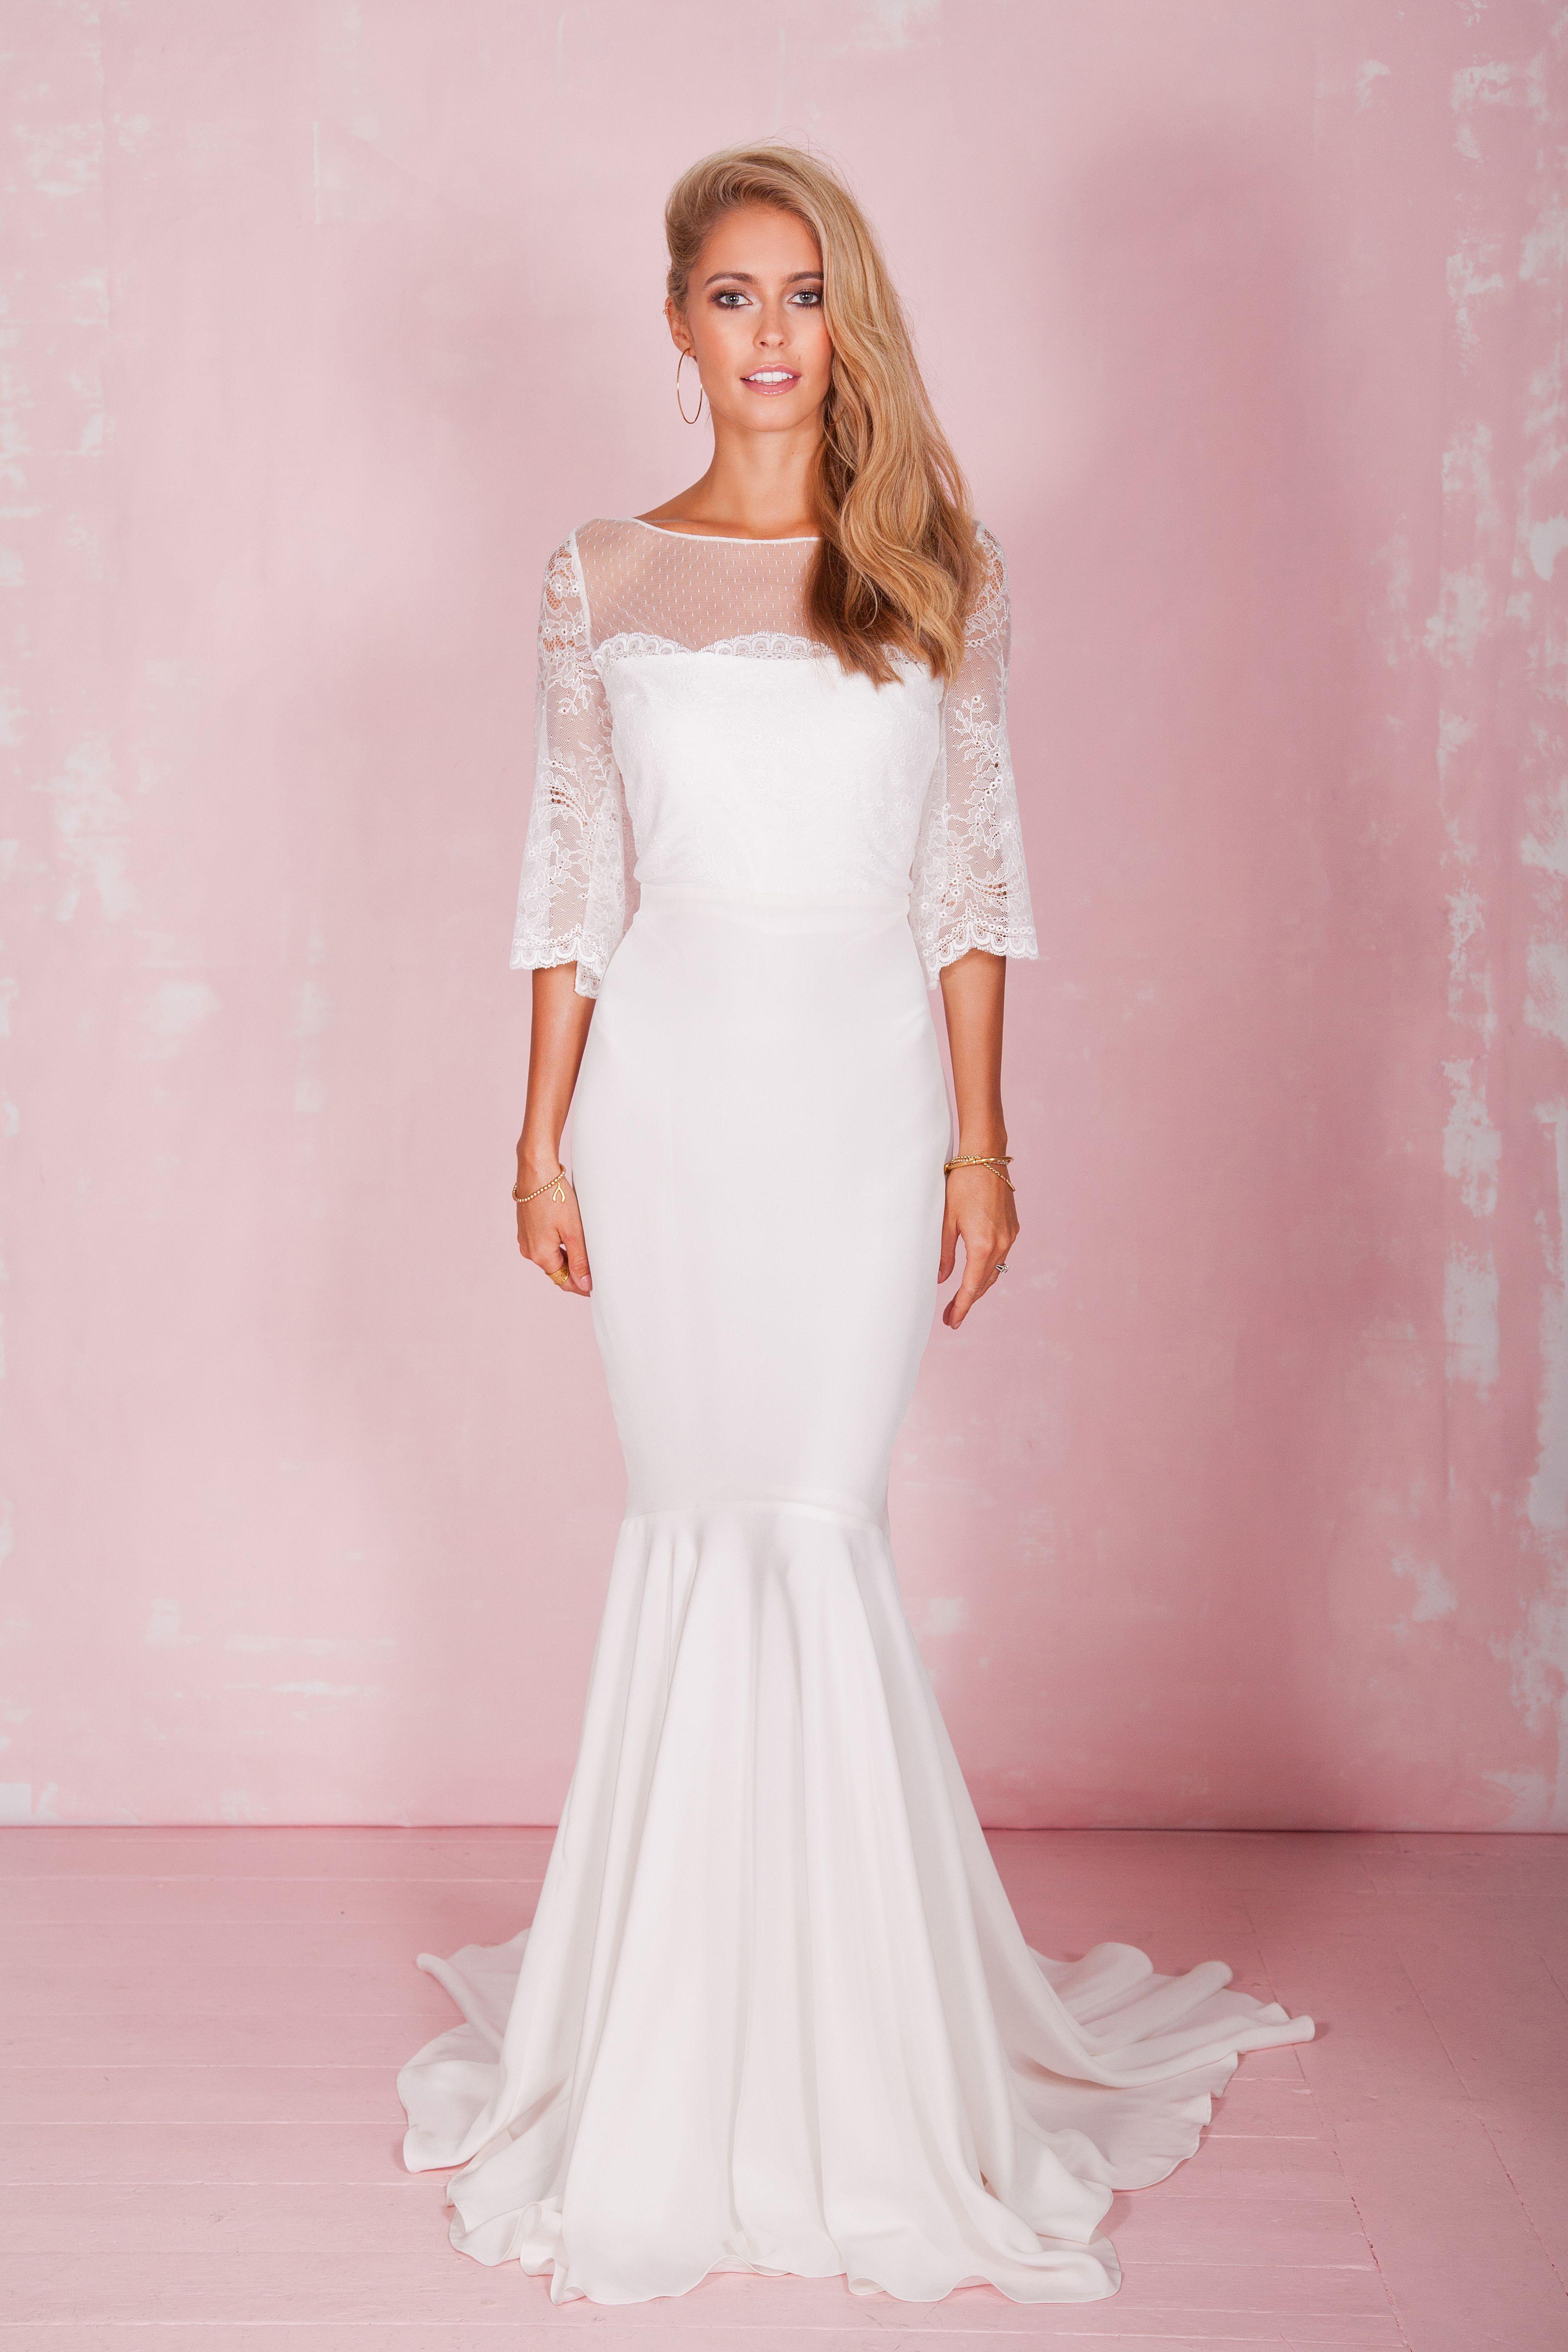 Rosie dress celebrities in pinterest wedding dresses